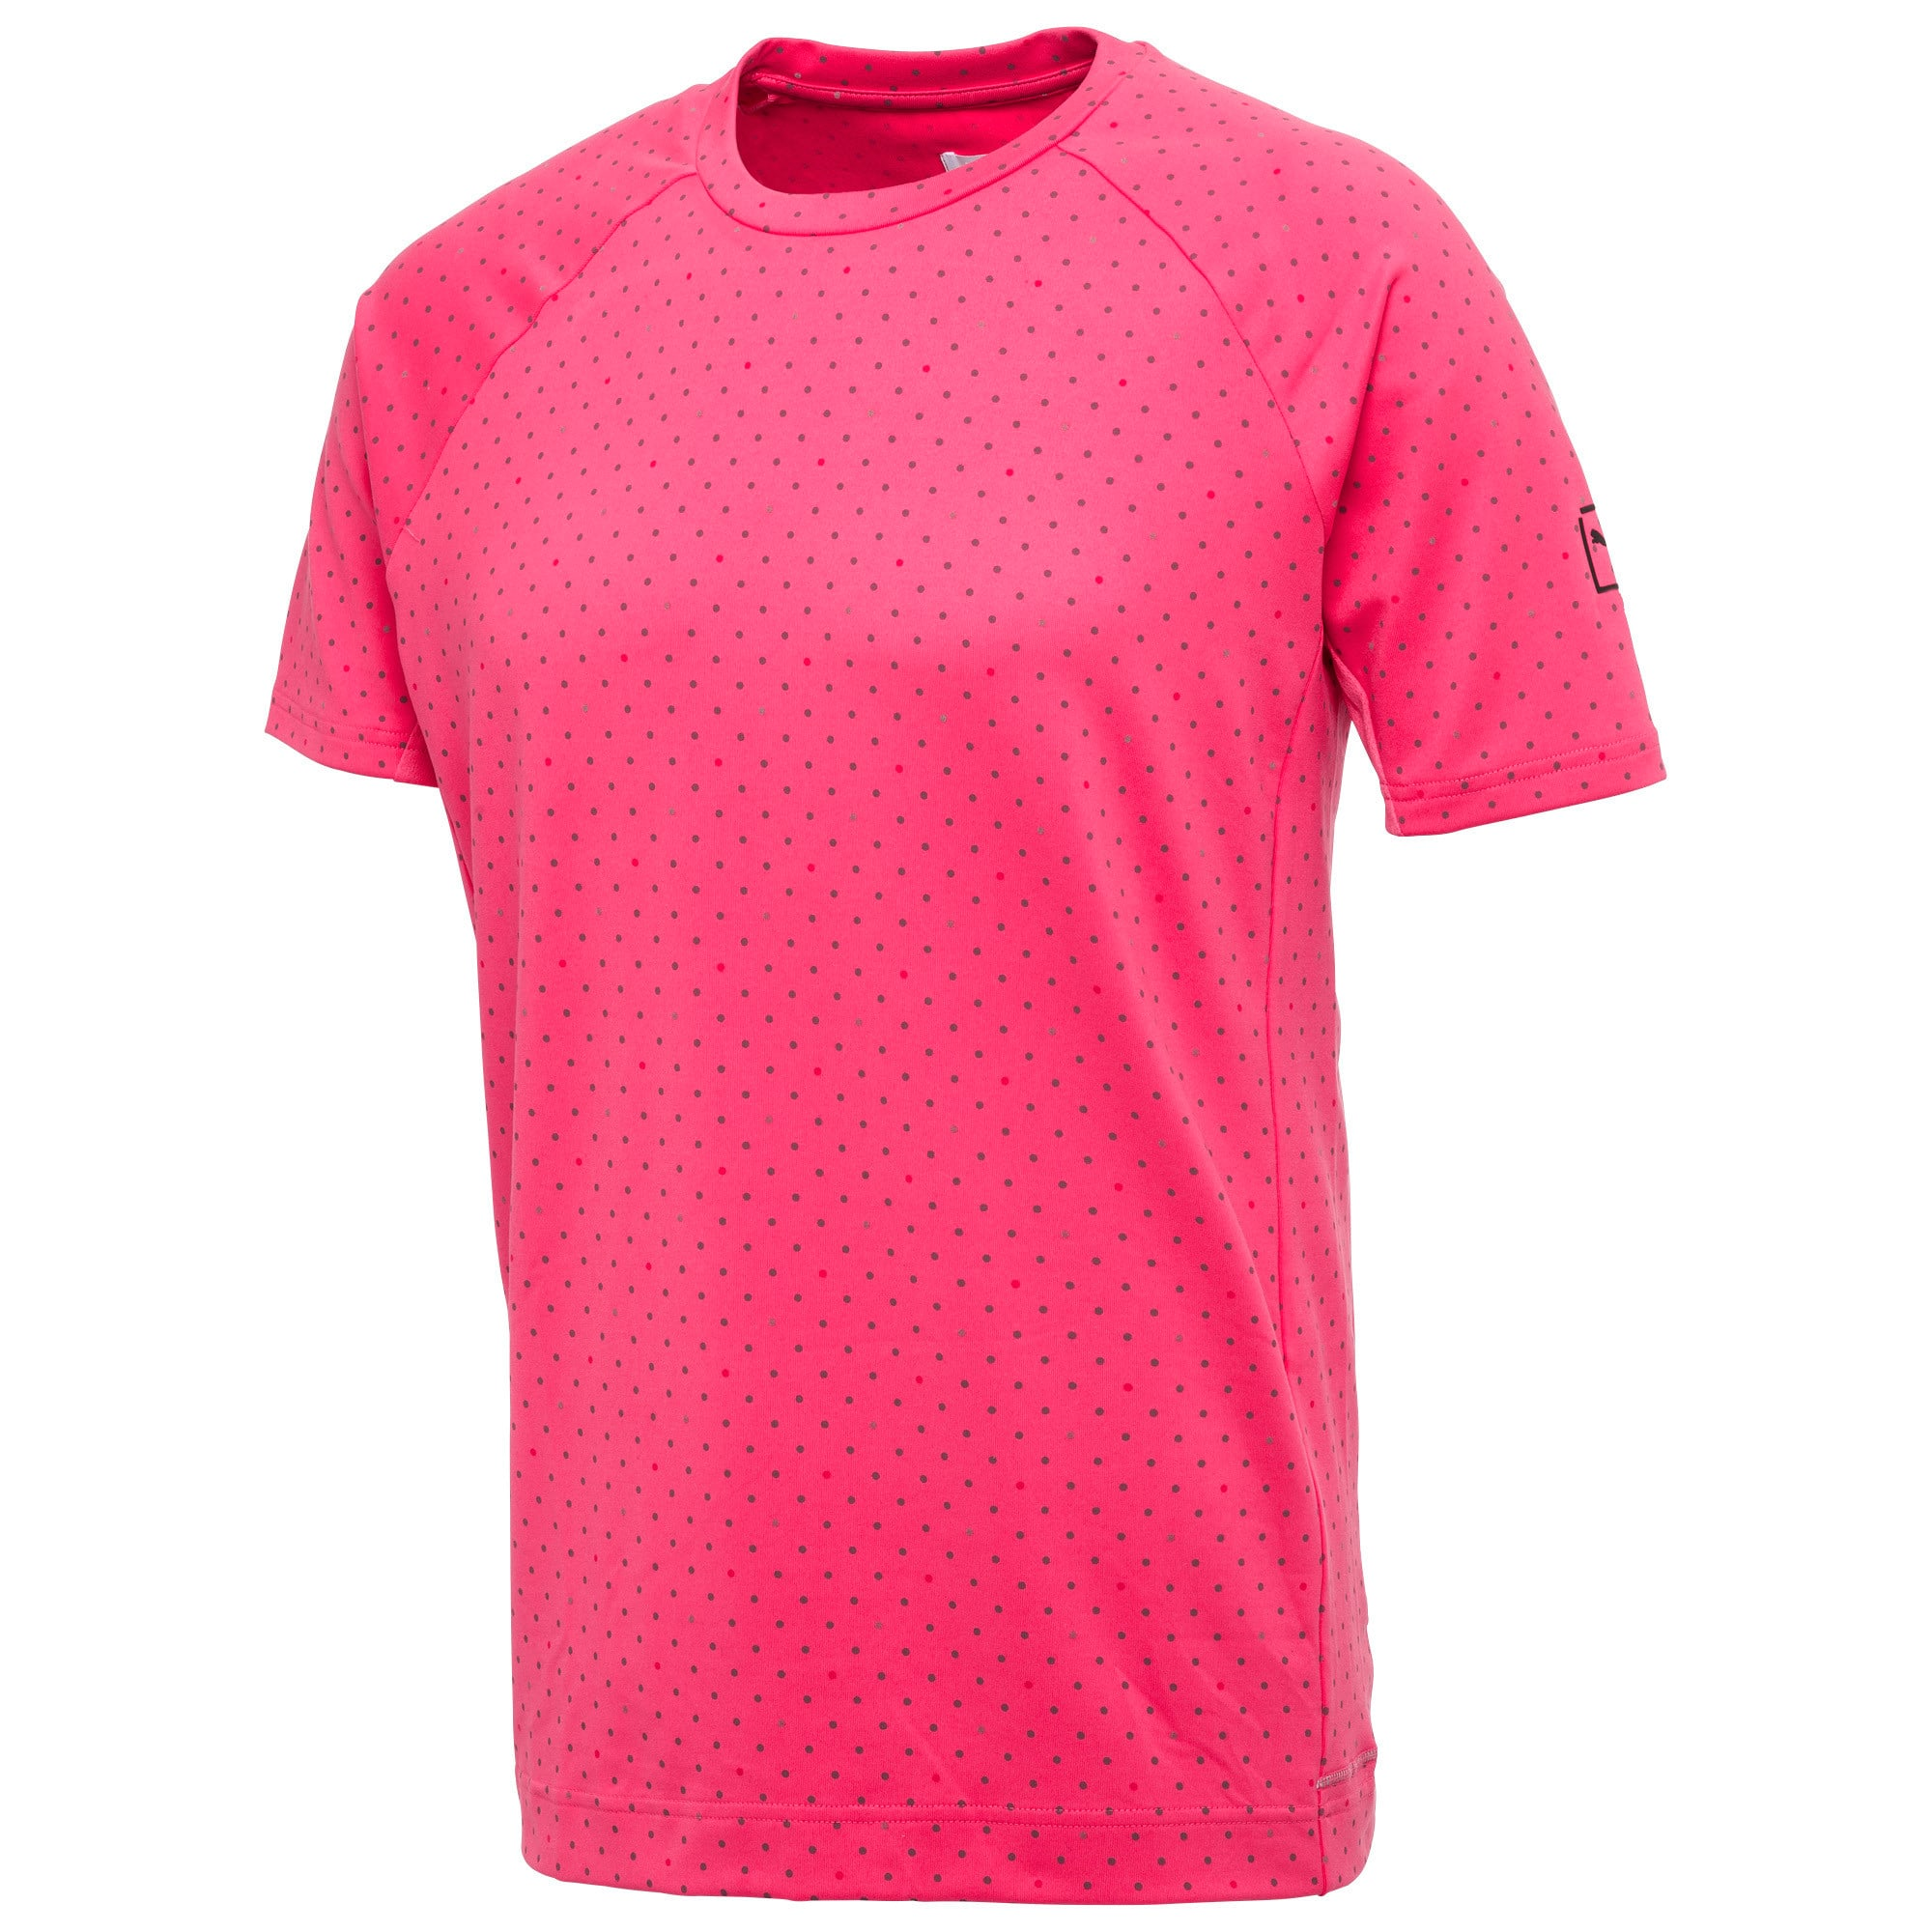 Thumbnail 1 of PUMA x STAPLE T-Shirt, Paradise Pink, medium-IND